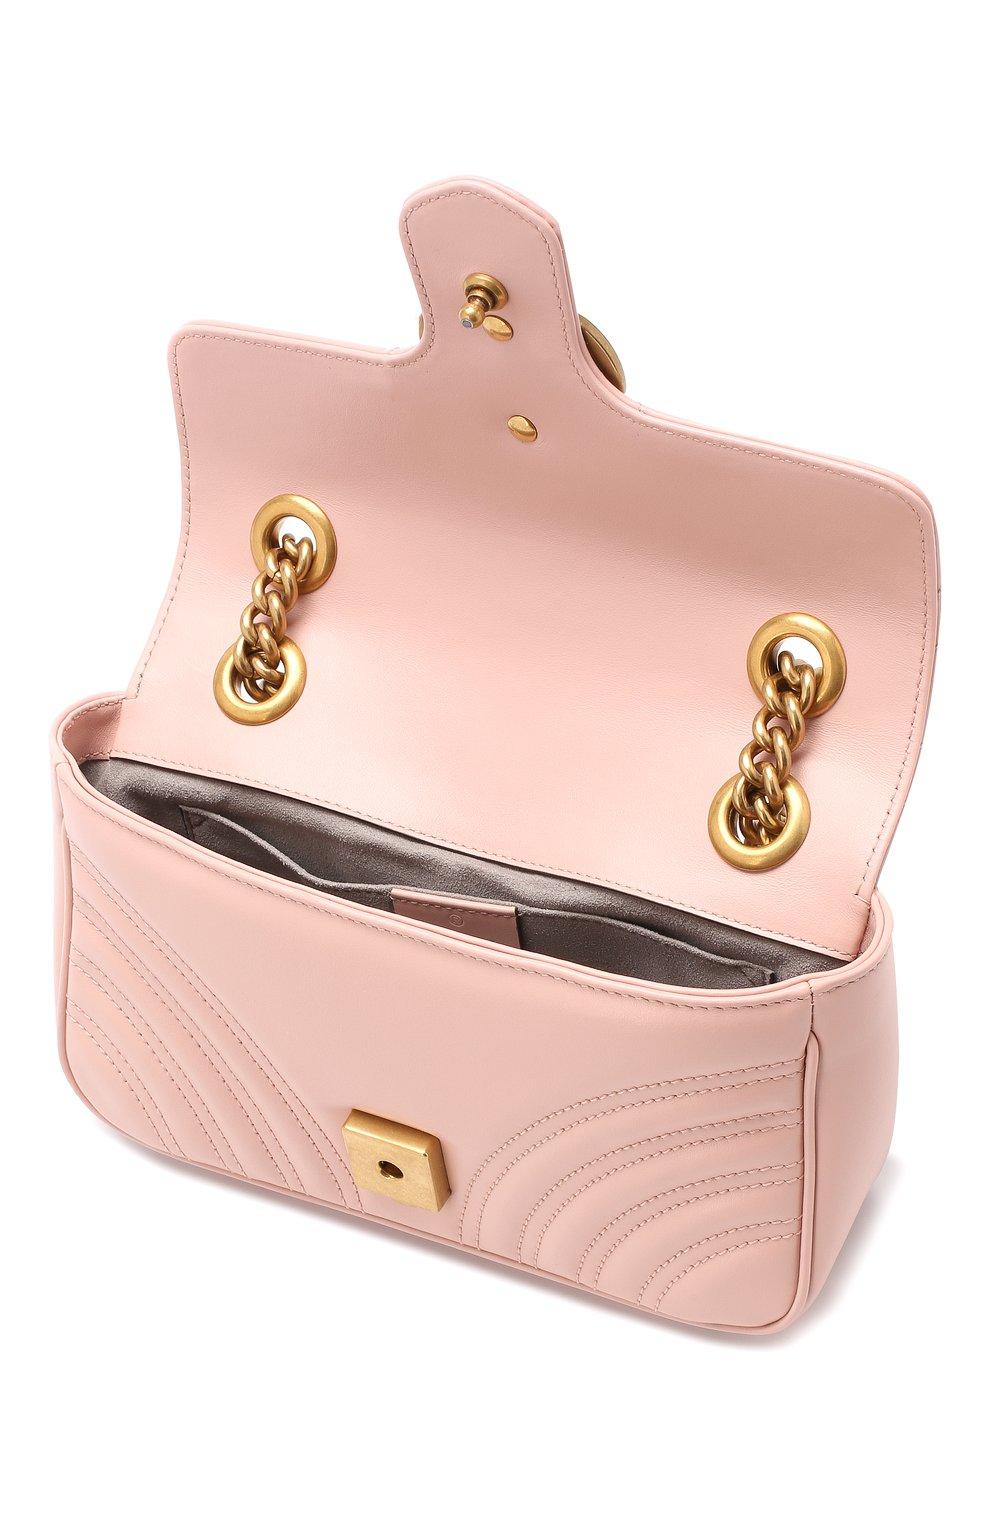 Сумка GG Marmont Gucci розовая цвета | Фото №4